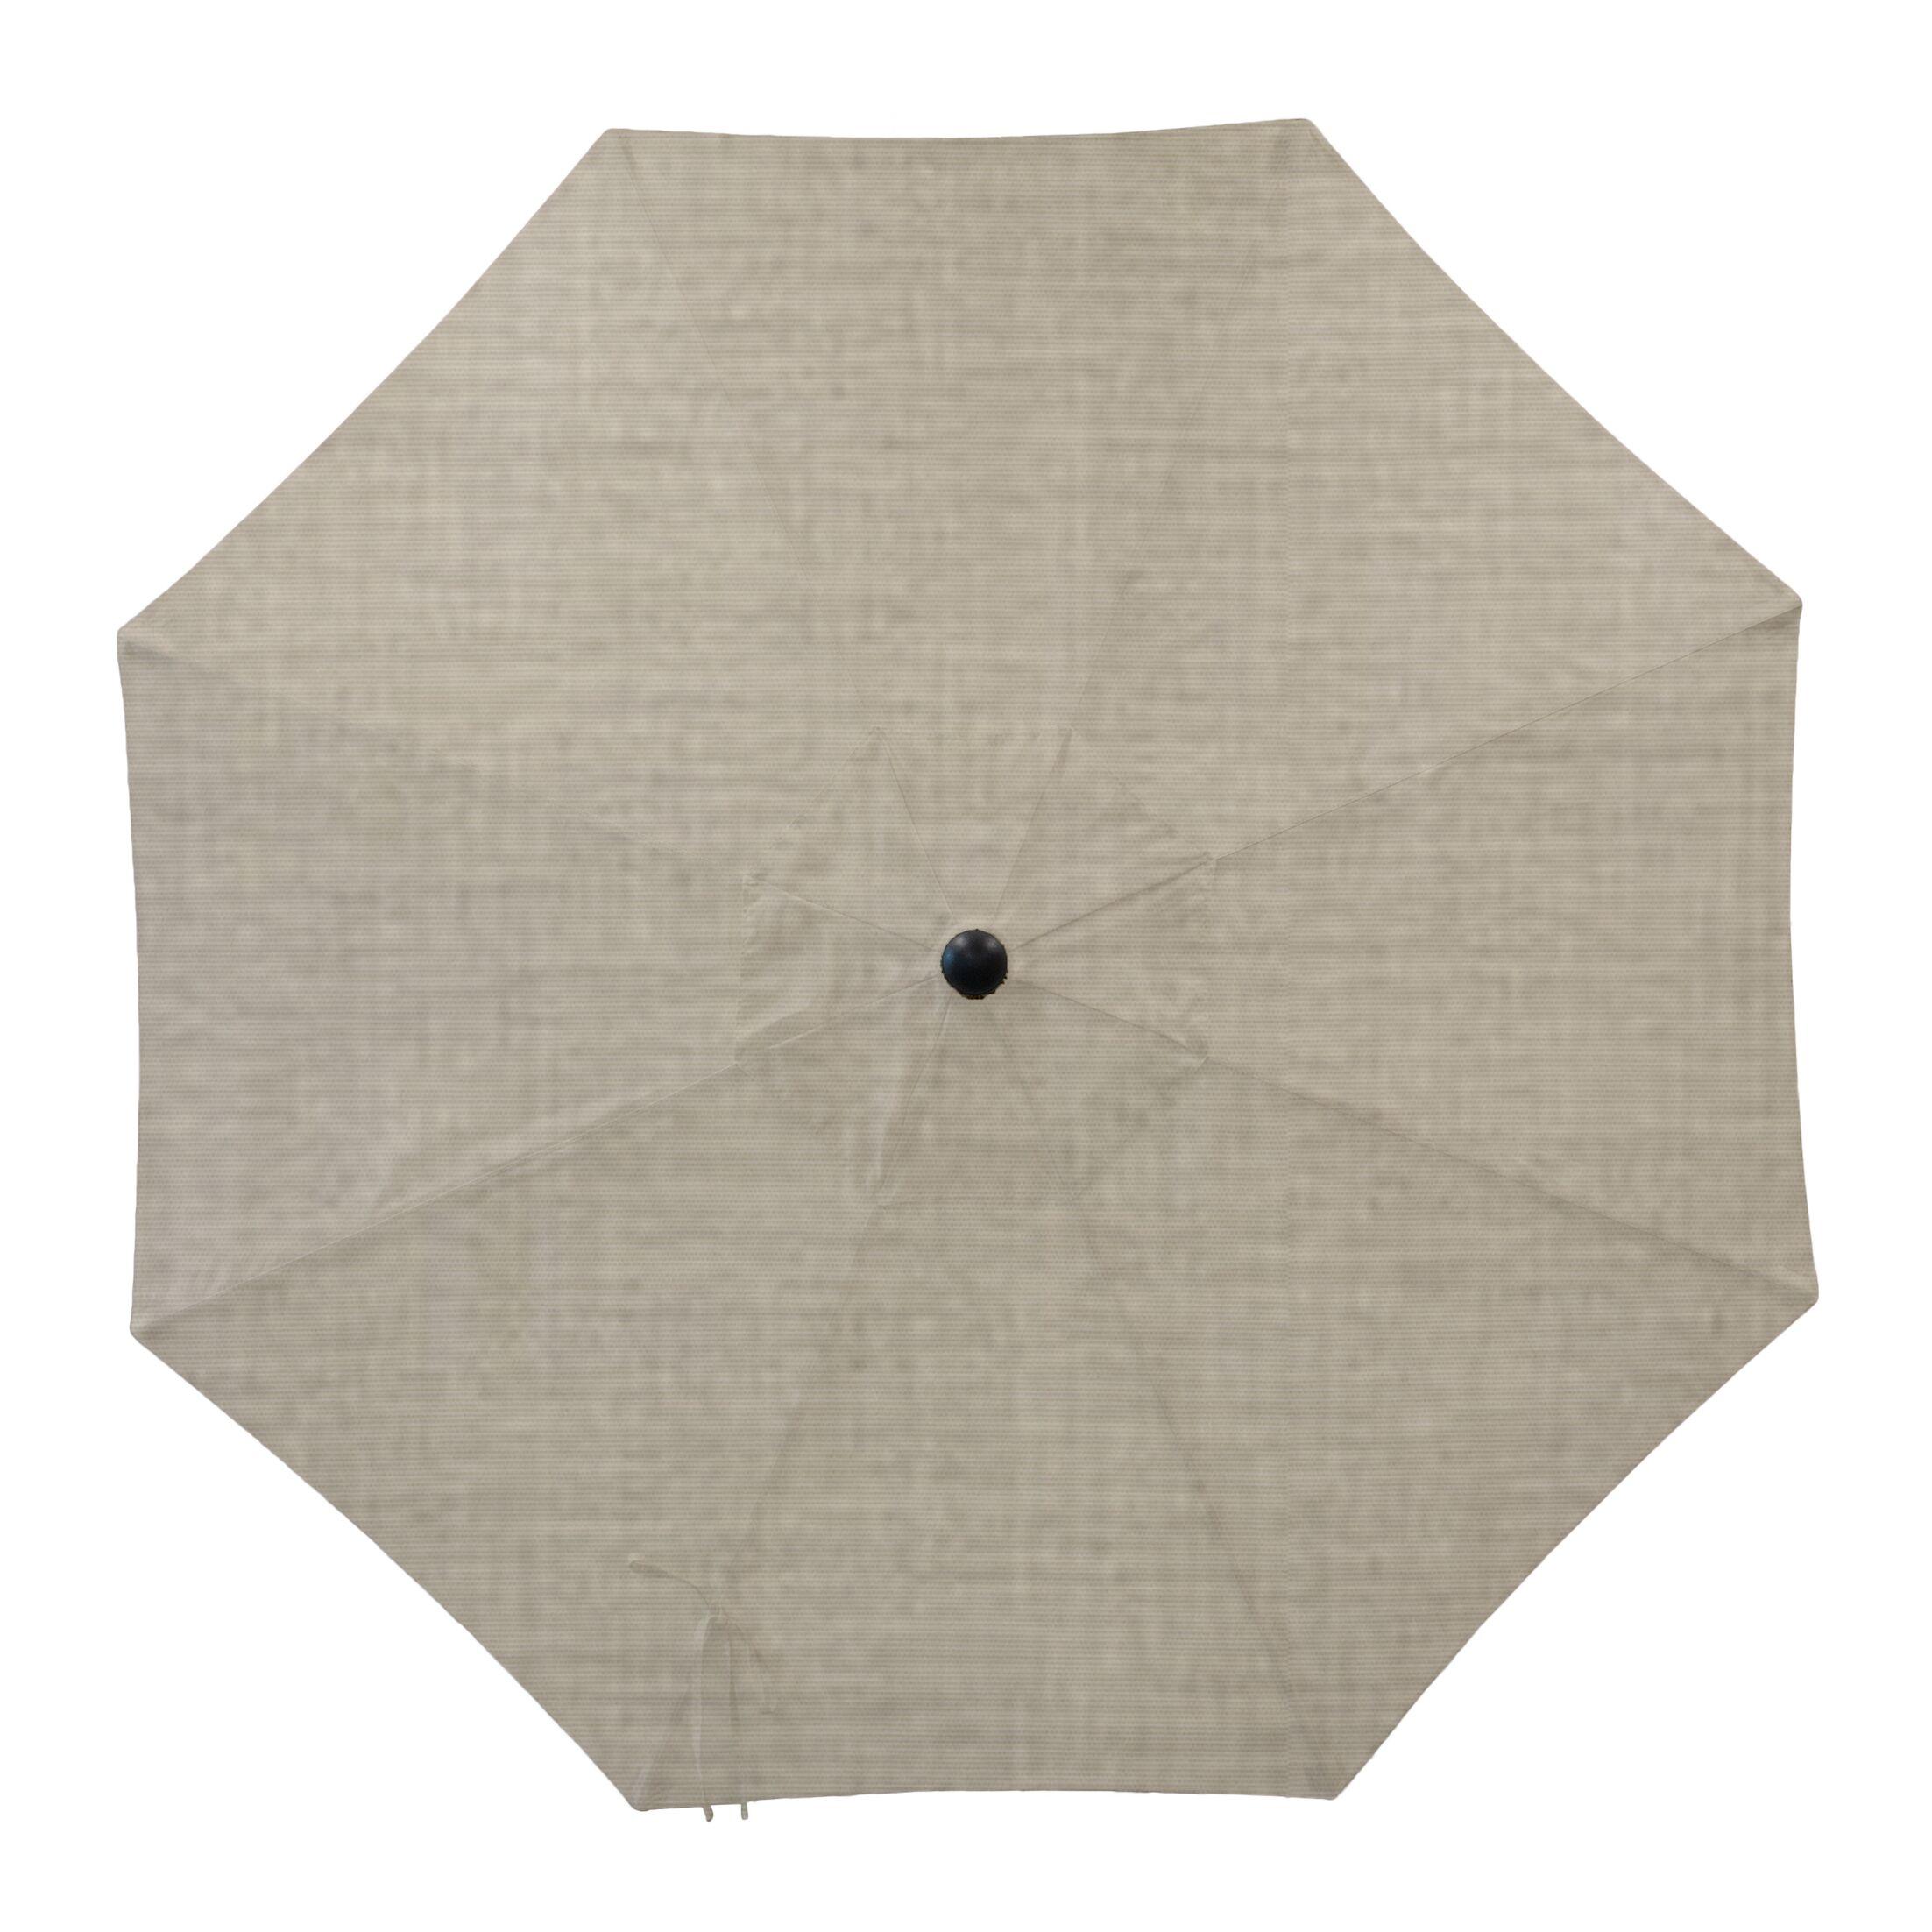 Centeno Double Pulley 9' Market Sunbrella Umbrella Fabric Color: Cast Silver, Frame Color: Silver Mirror